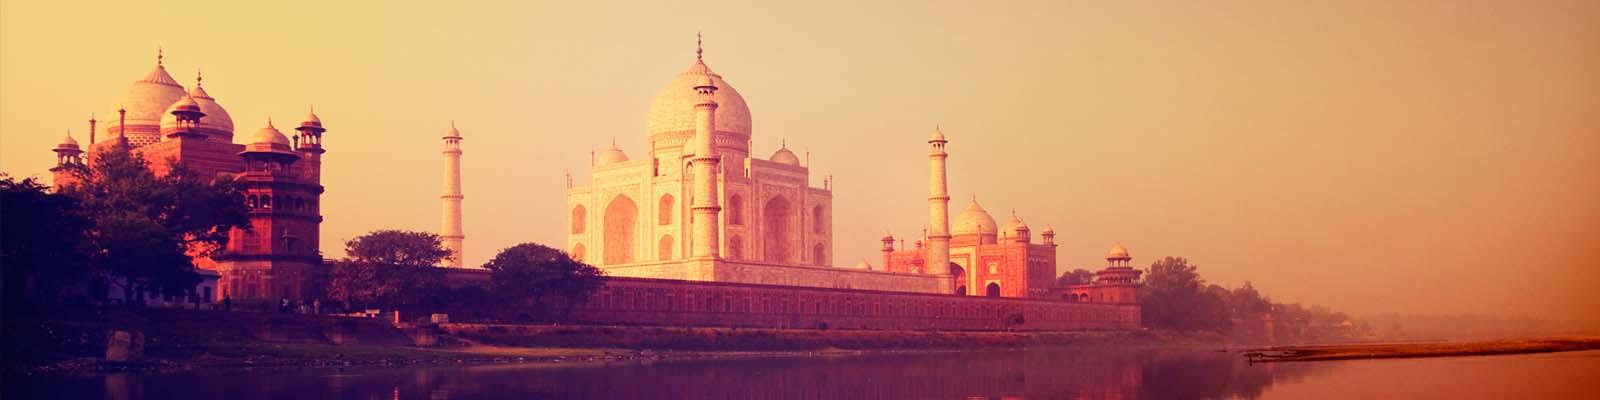 عکس هدر هند